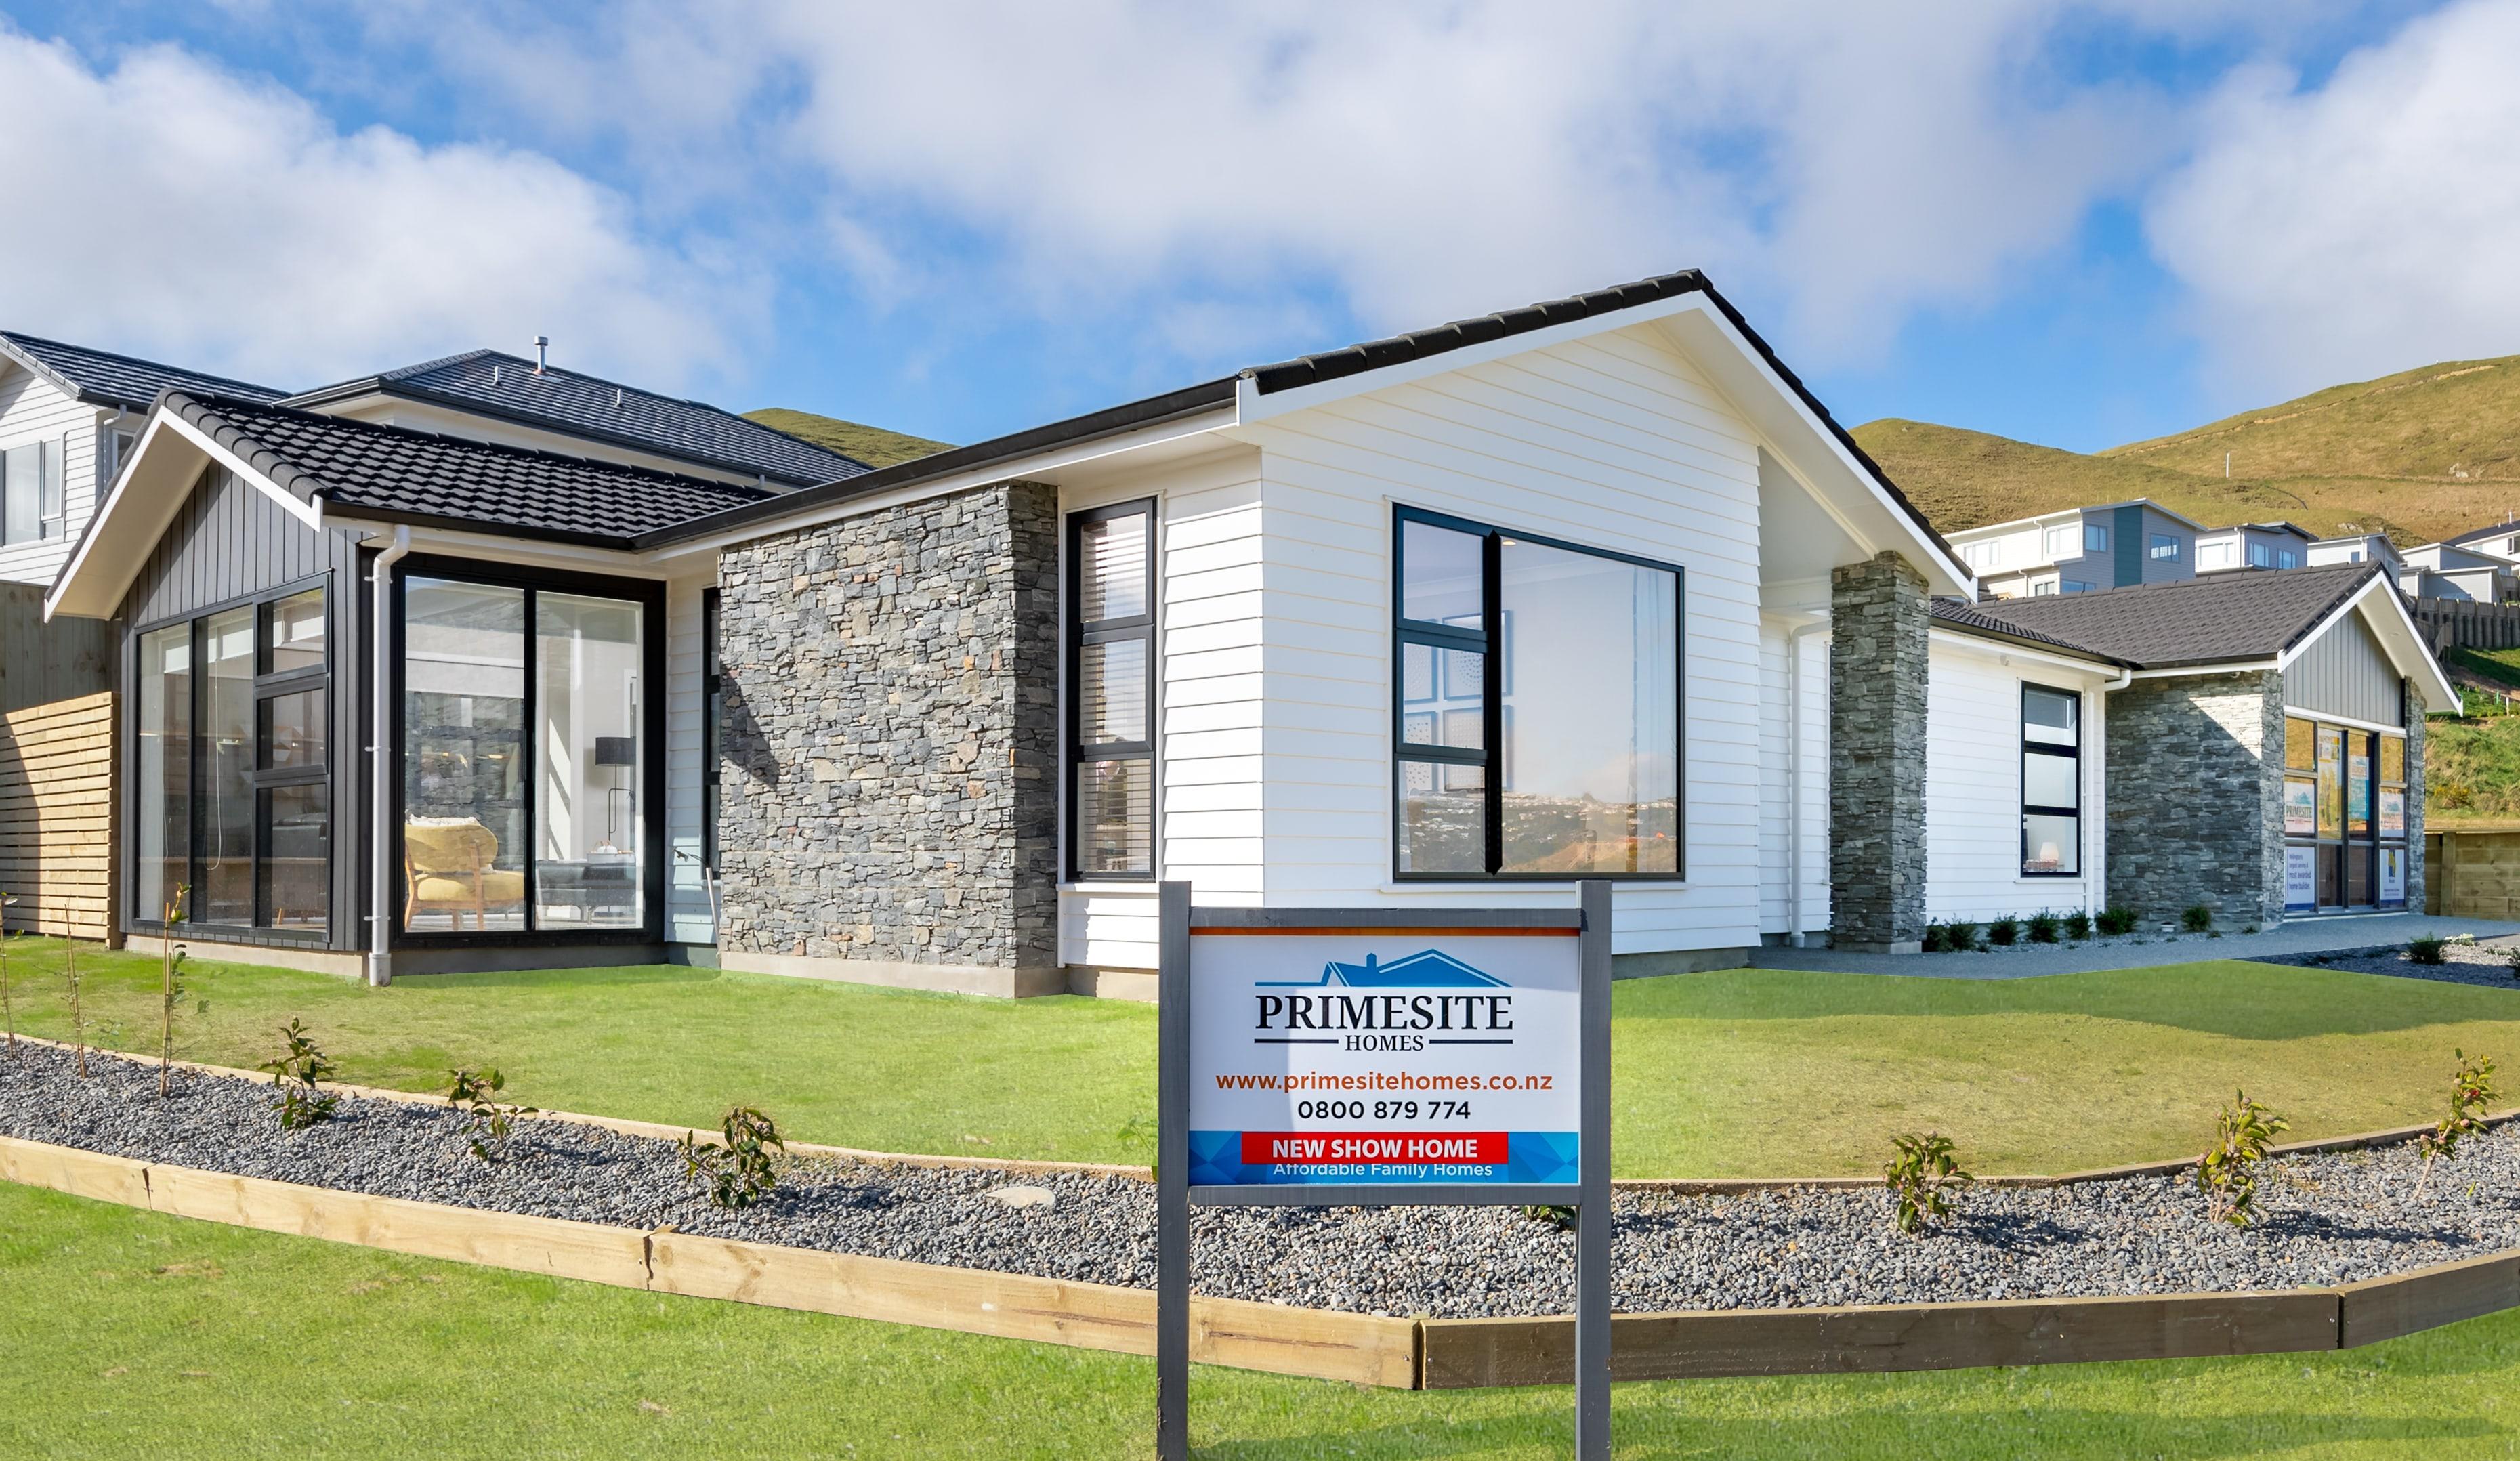 Primesite Homes New Show Home Churton Park Wellington